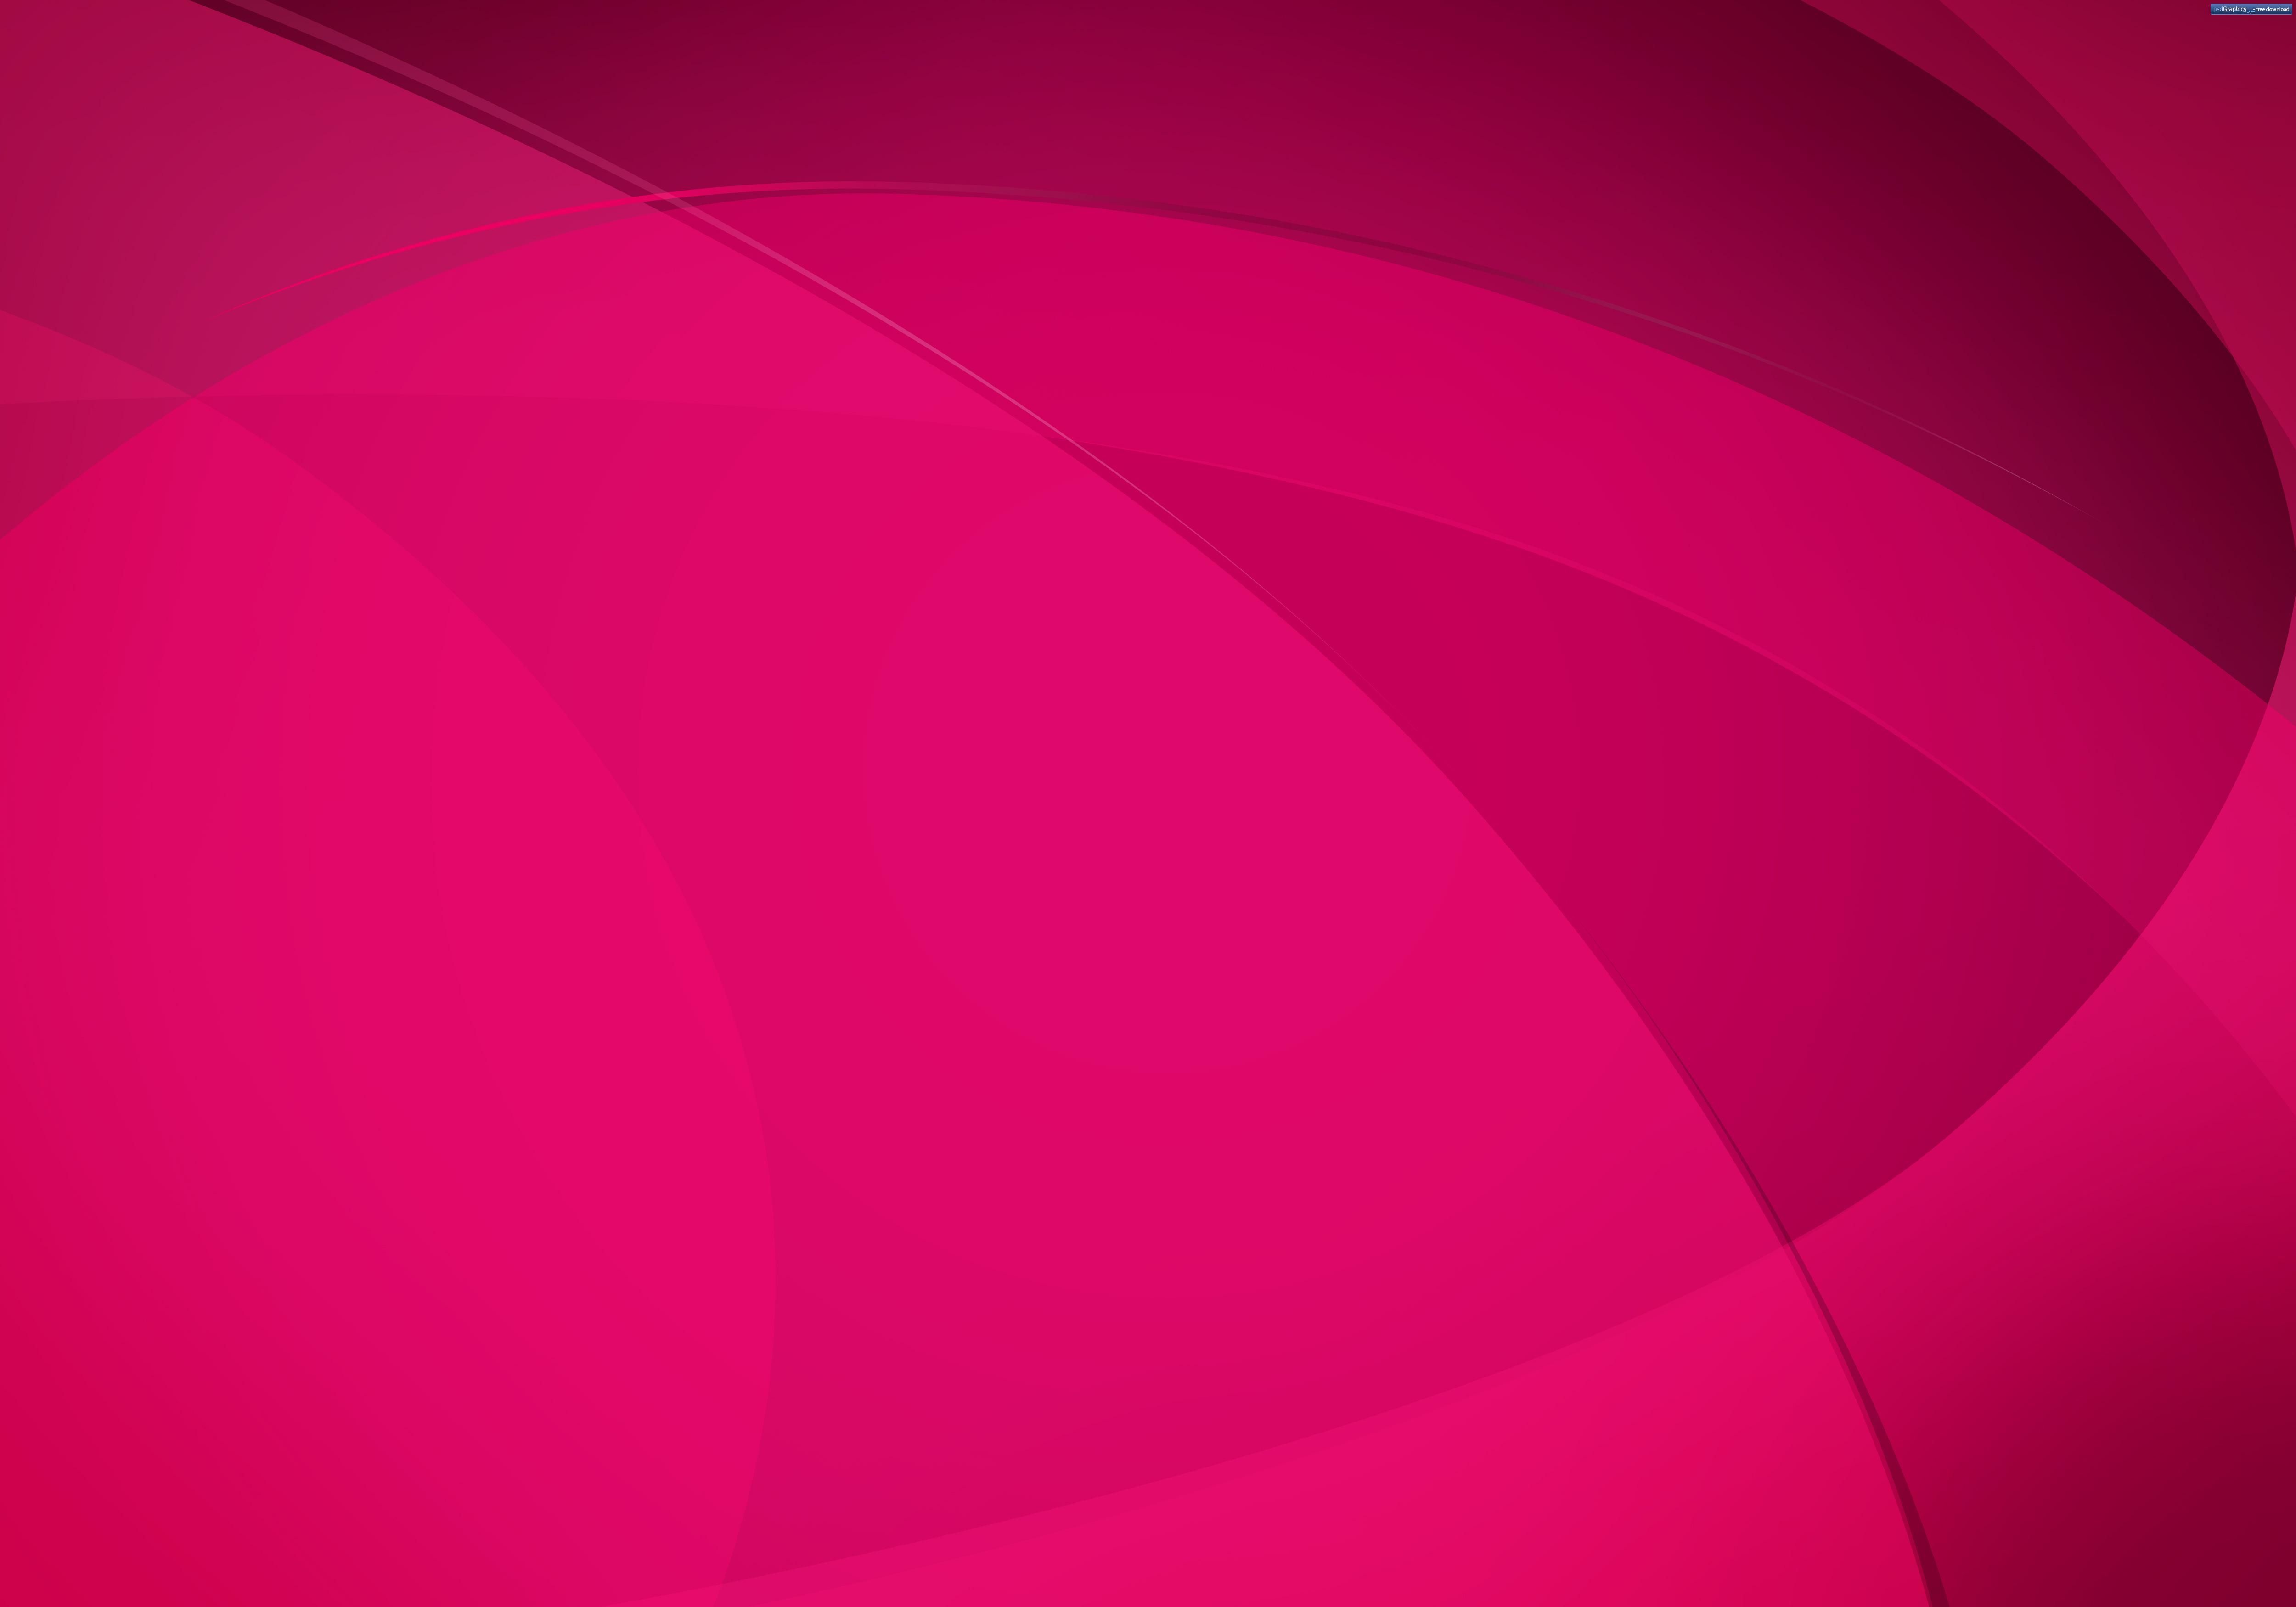 Pink background PSDGraphics 5000x3500